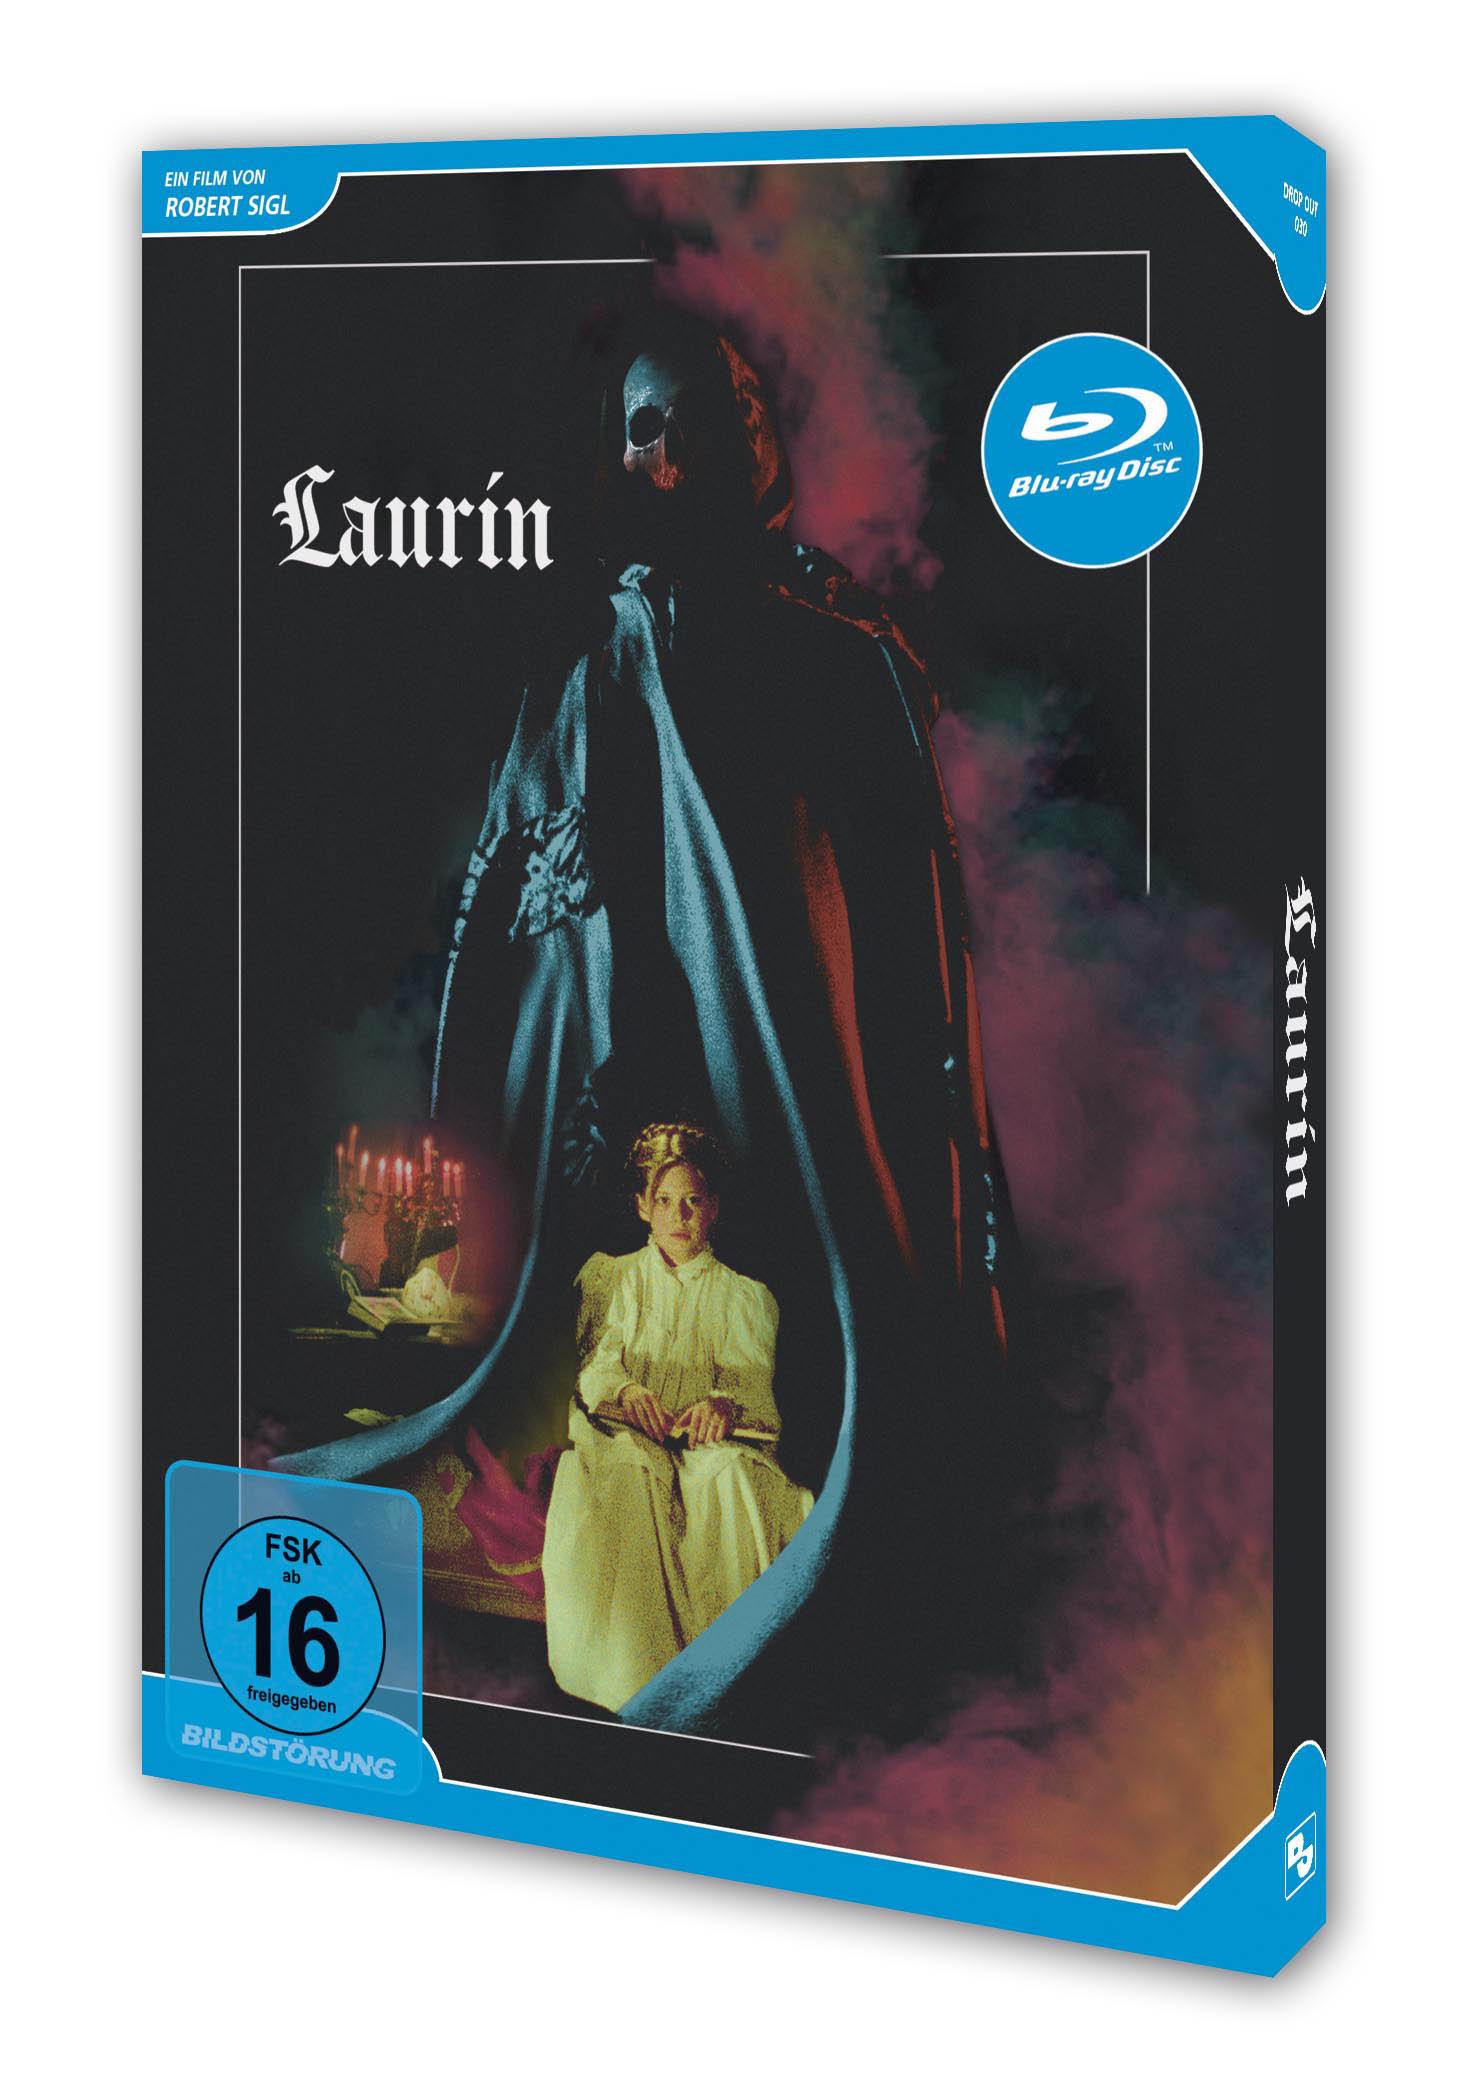 Blu-ray 3D